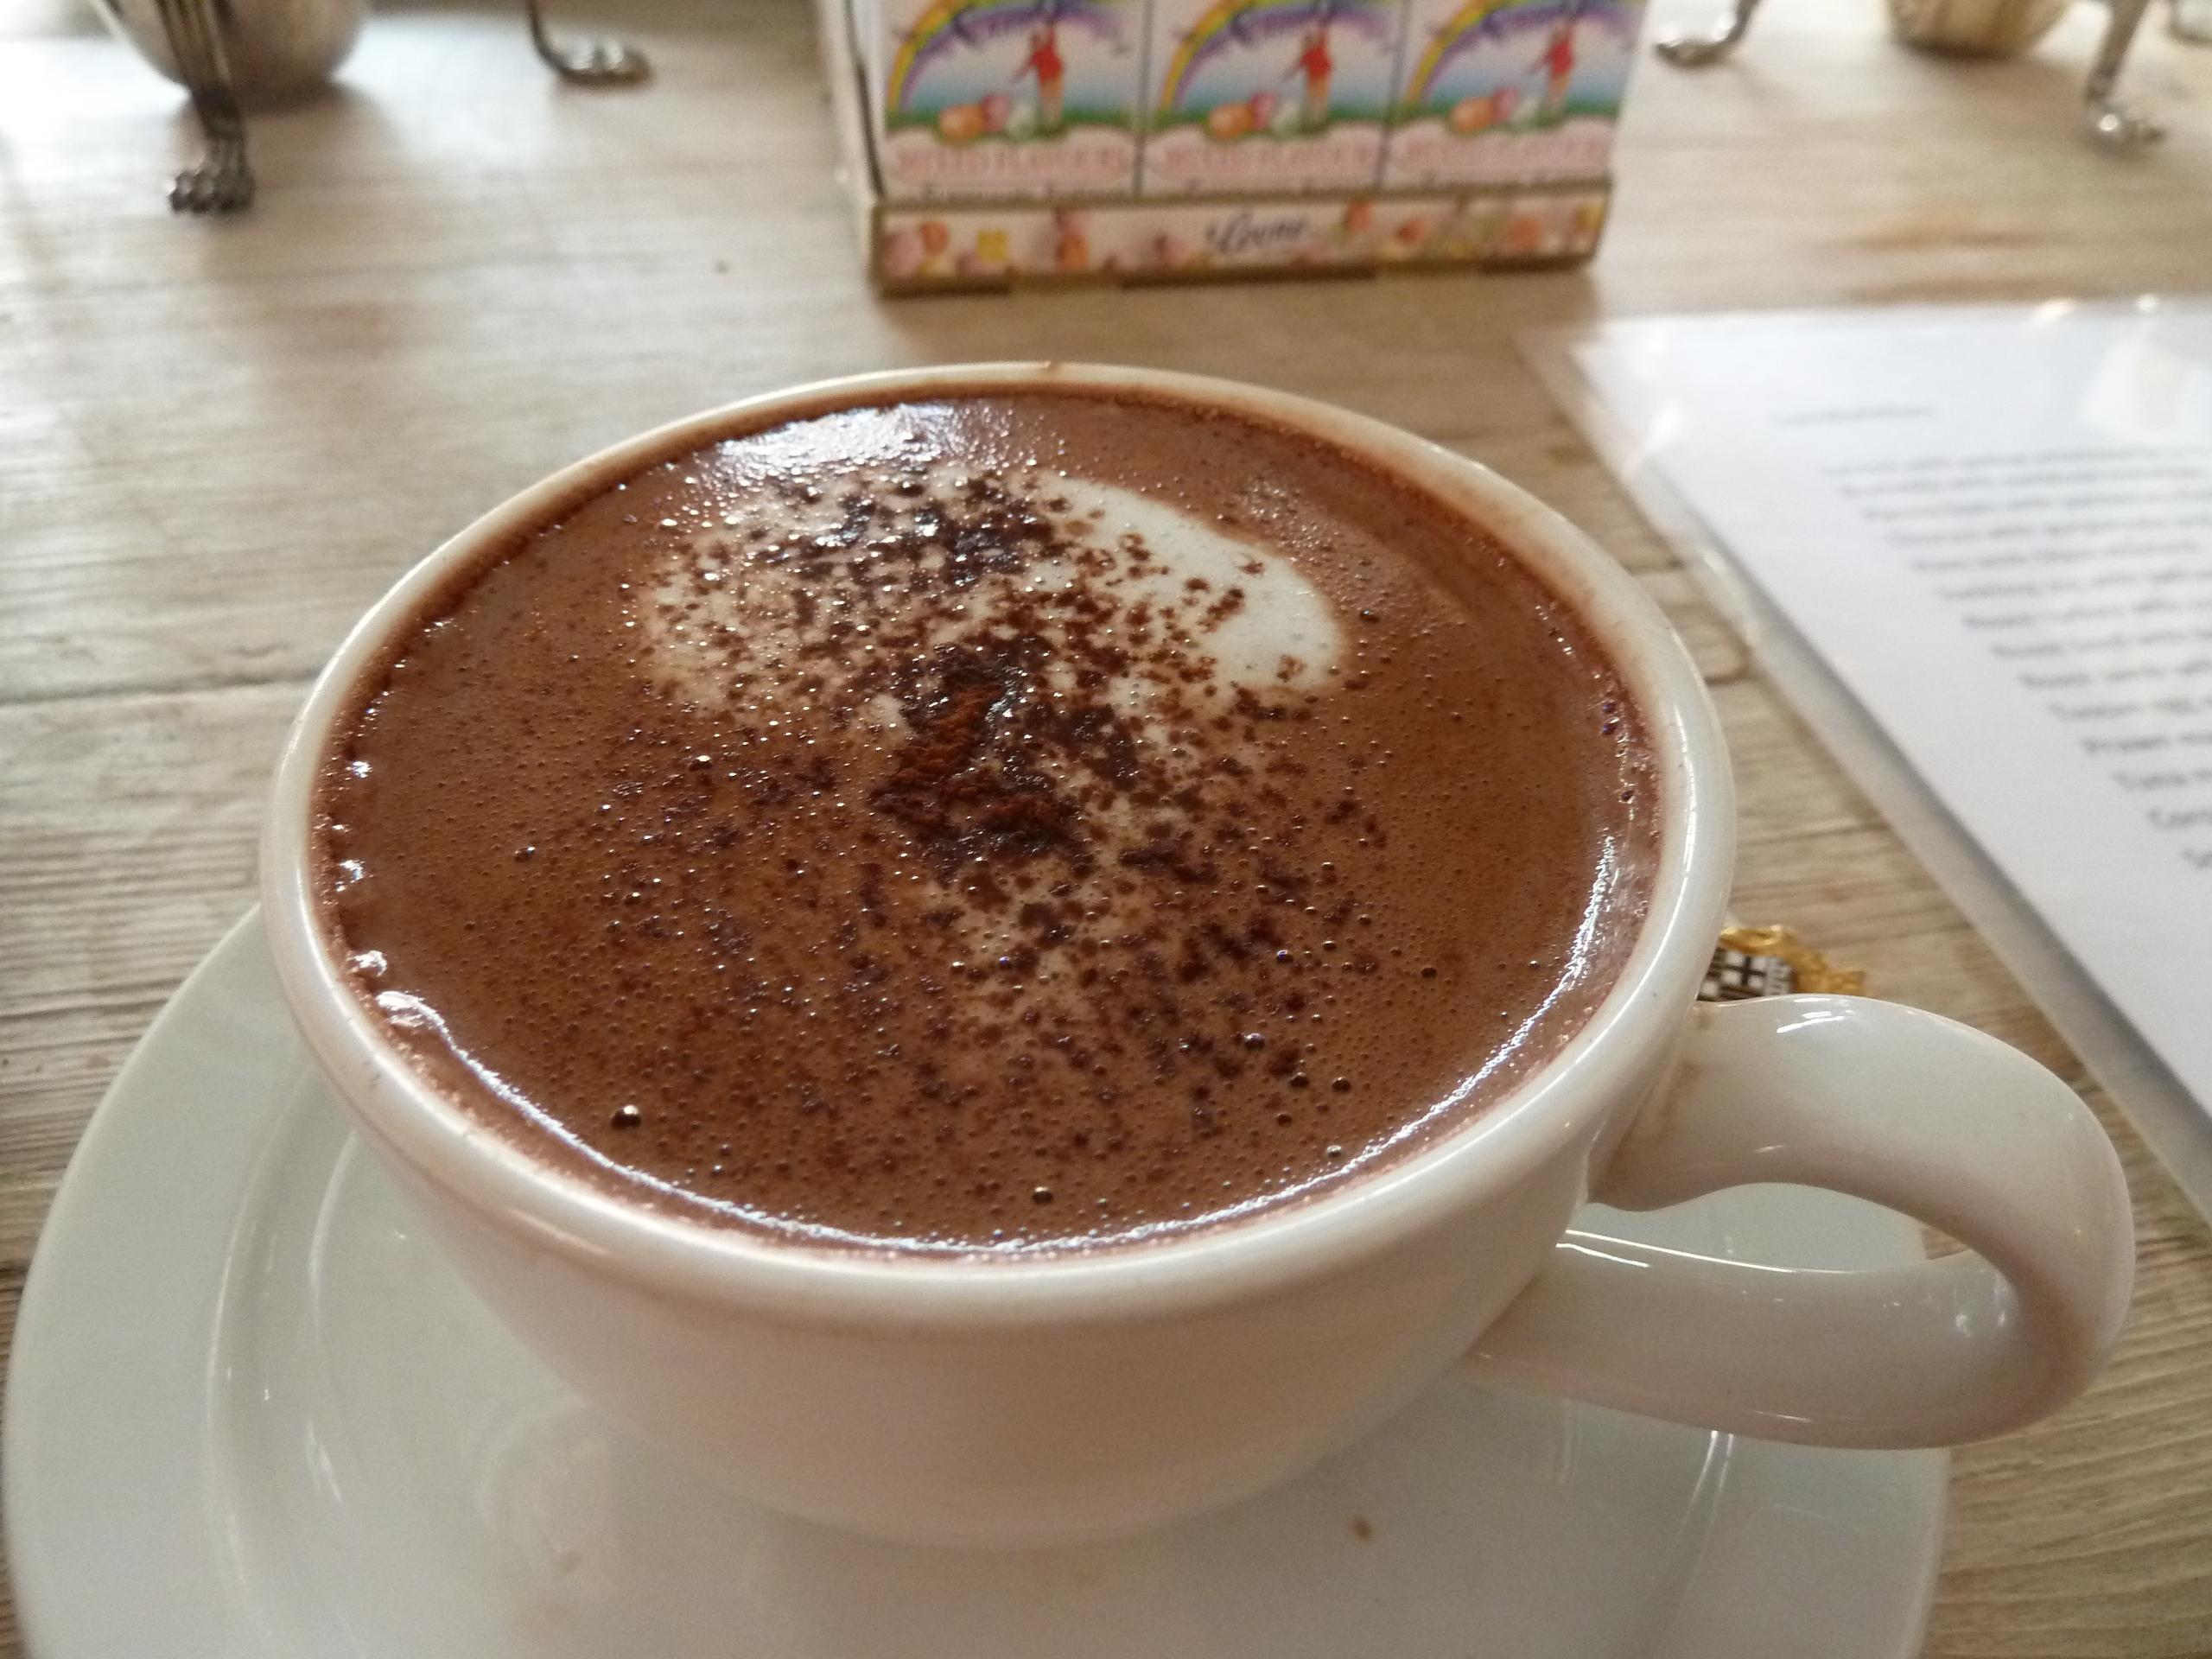 hot chocolate | Pheebz Eatz